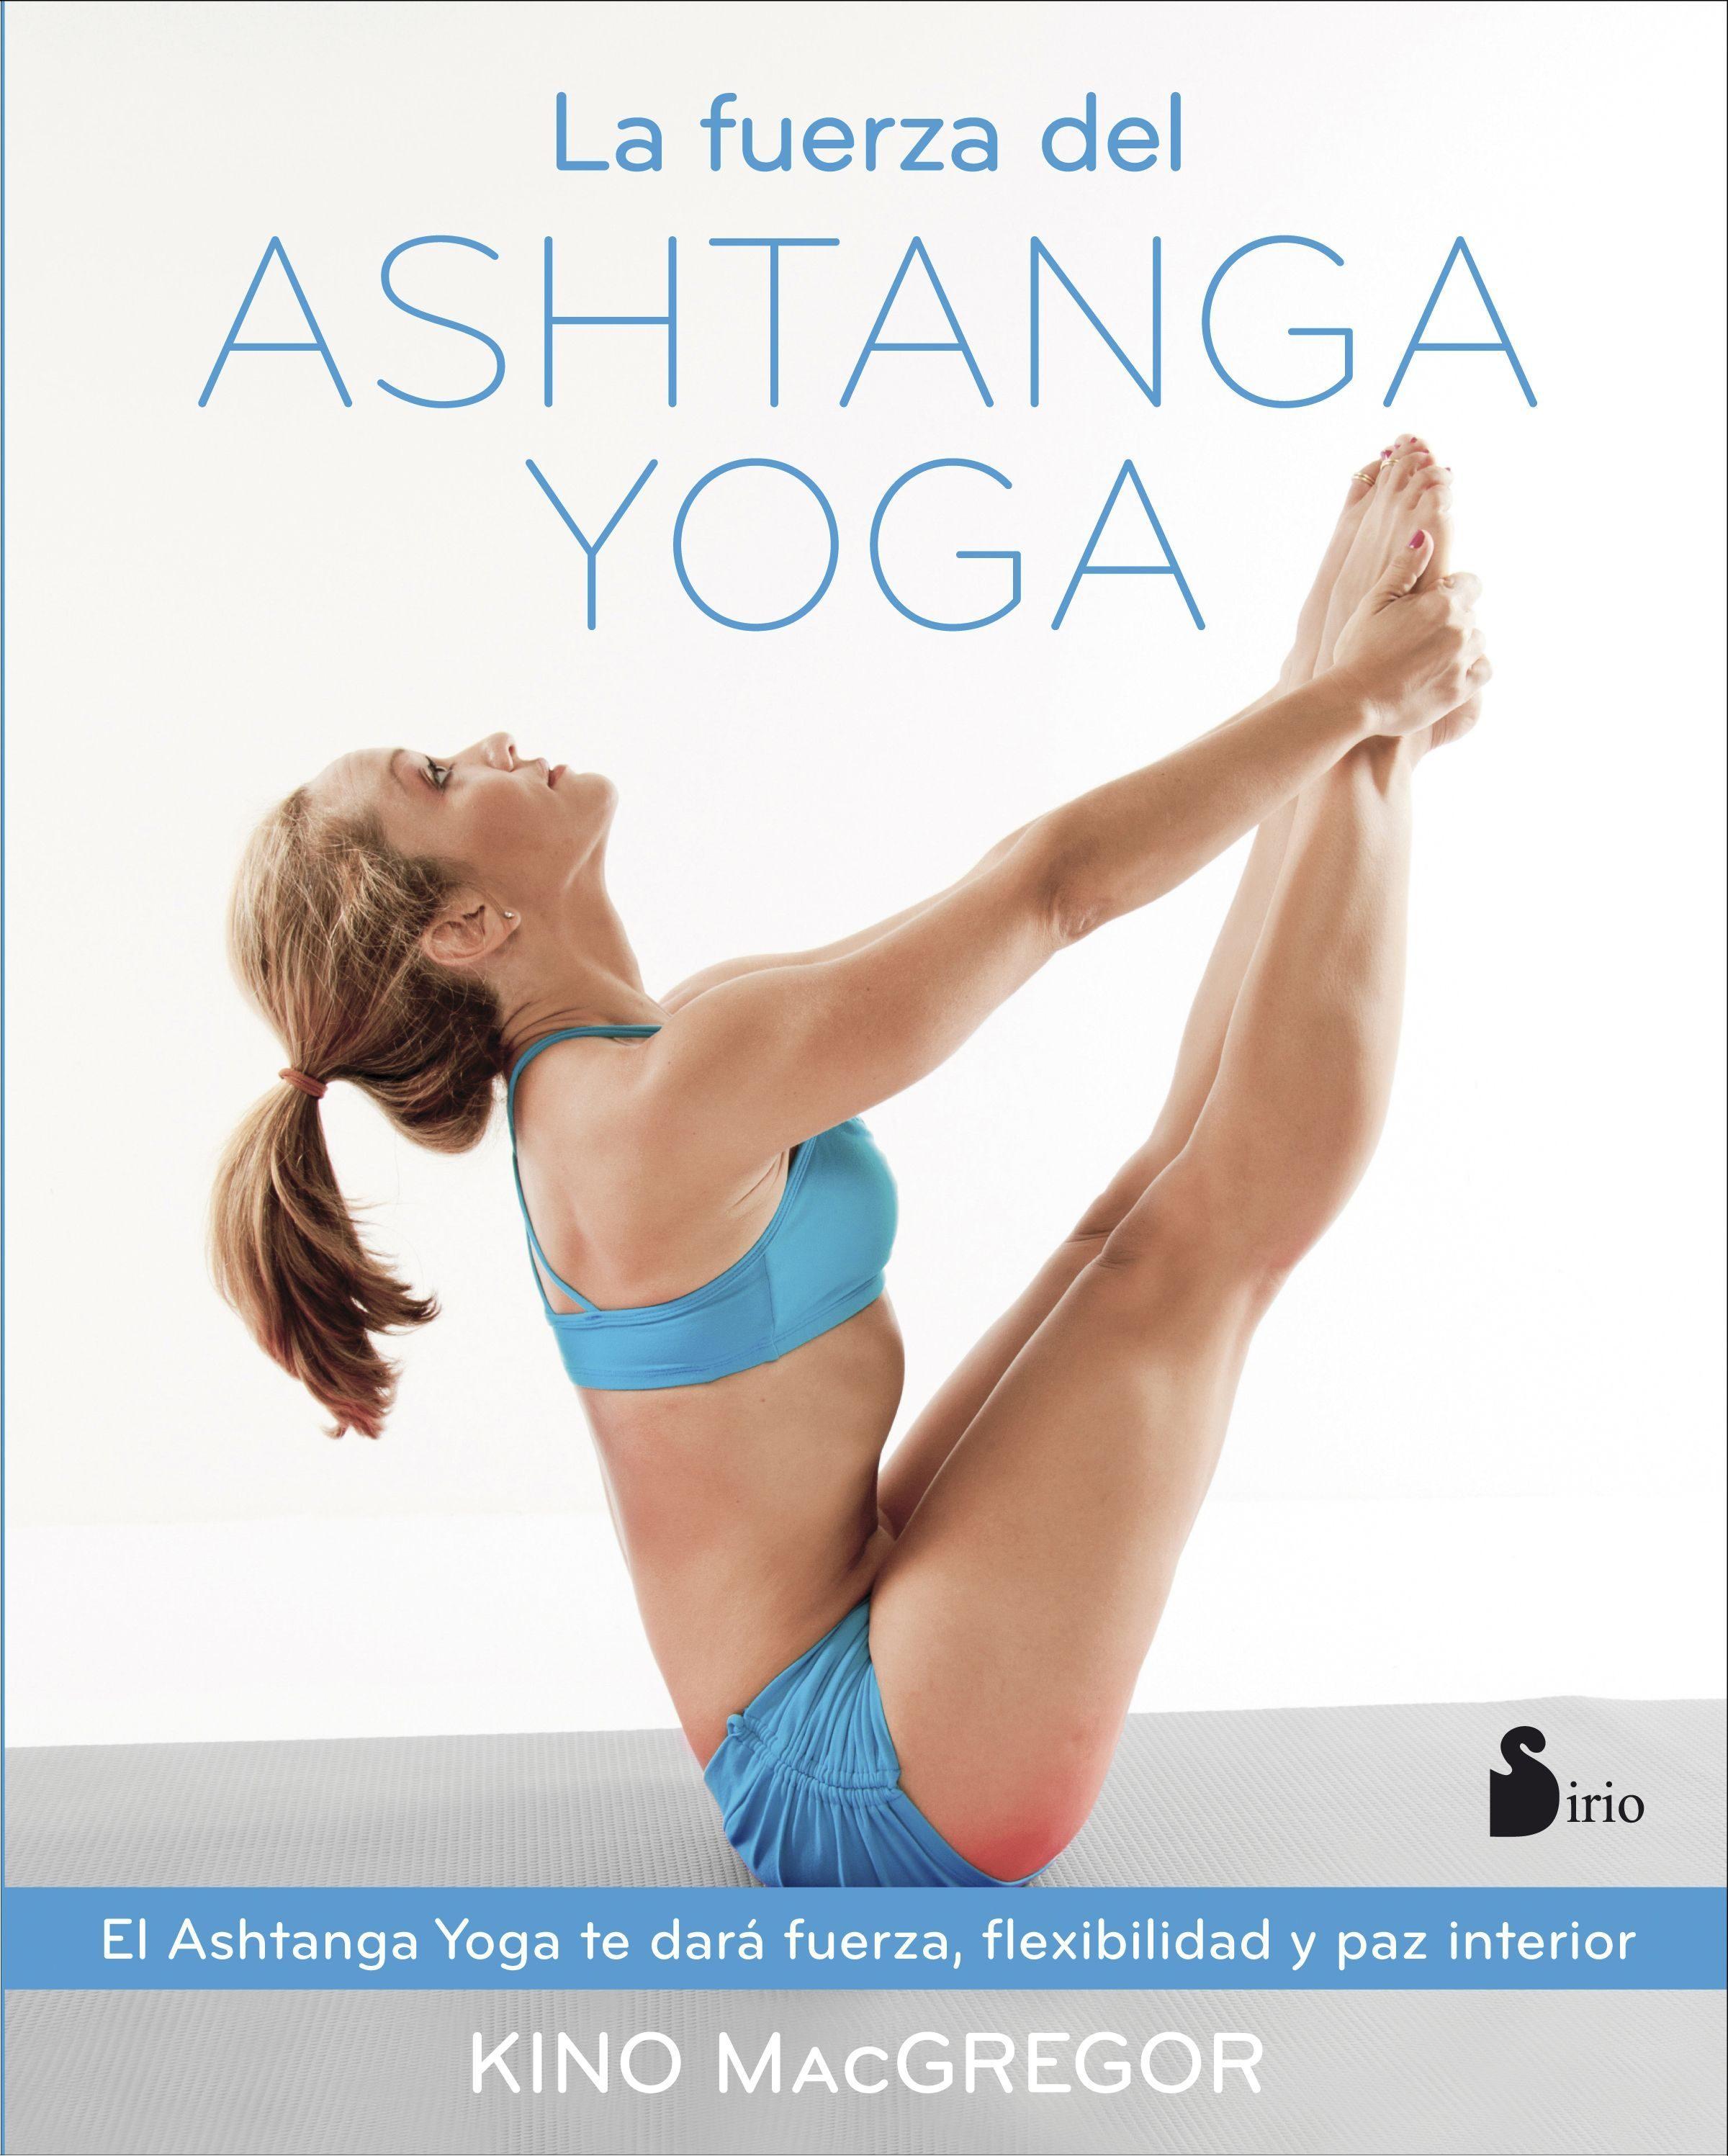 La Fuerza Del Ashtanga Yoga - Kino MacGregor - Sirio